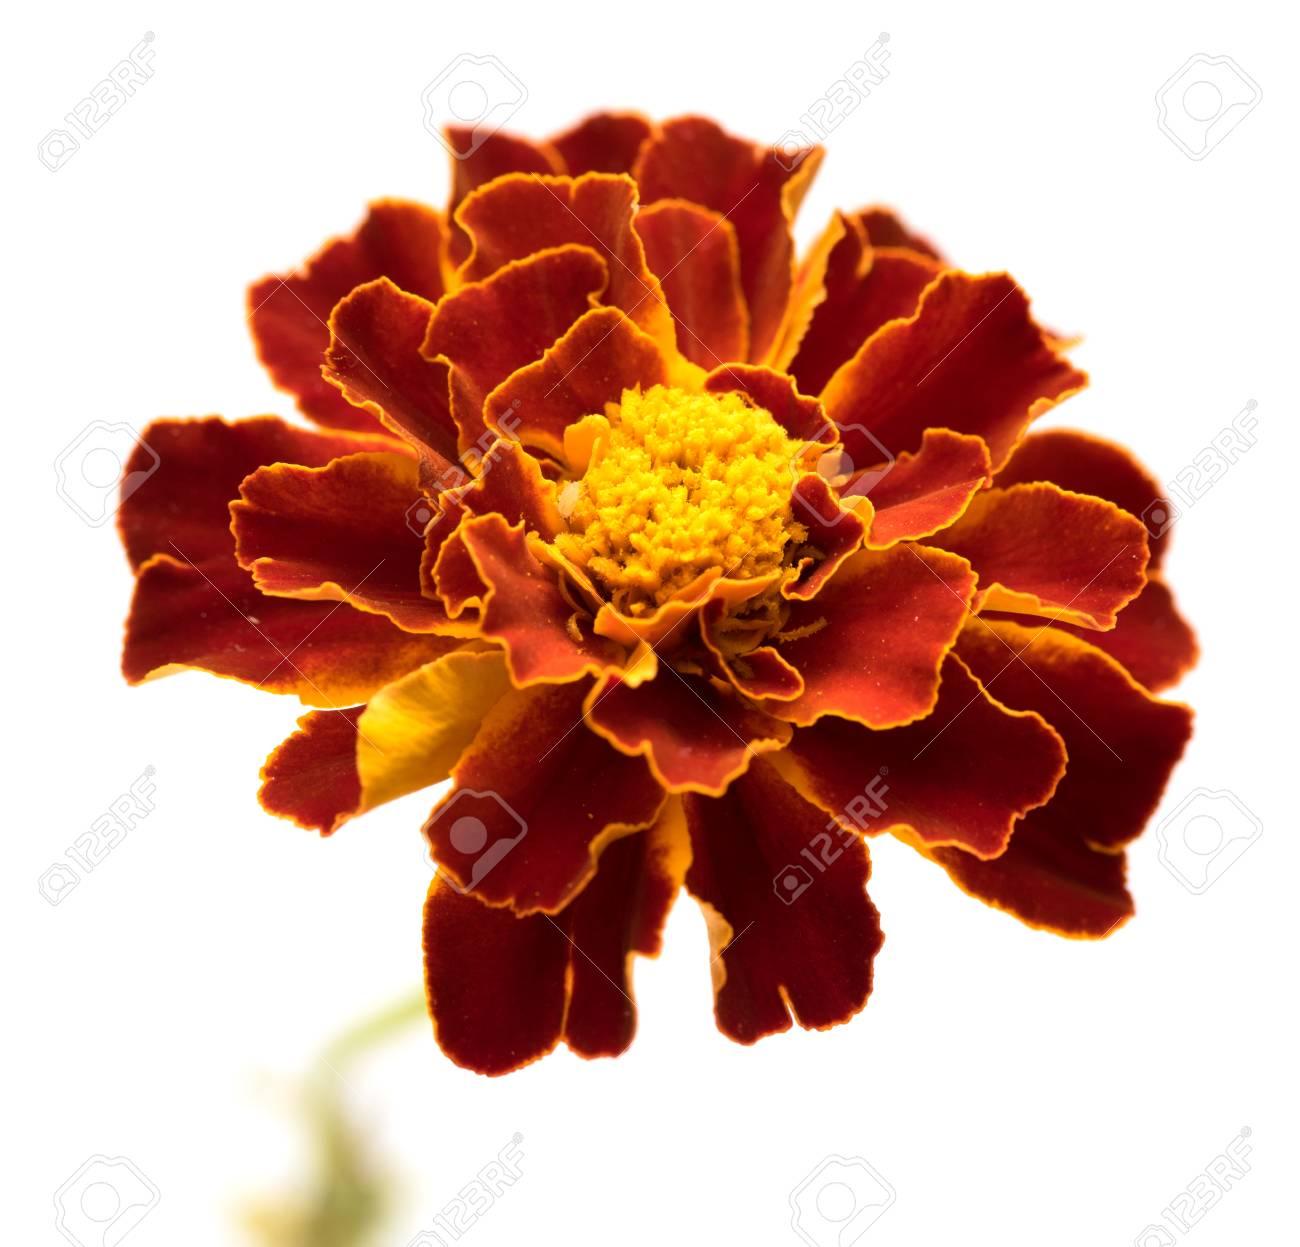 Marigold flowers isolated on white stock photo picture and royalty marigold flowers isolated on white stock photo 63566097 mightylinksfo